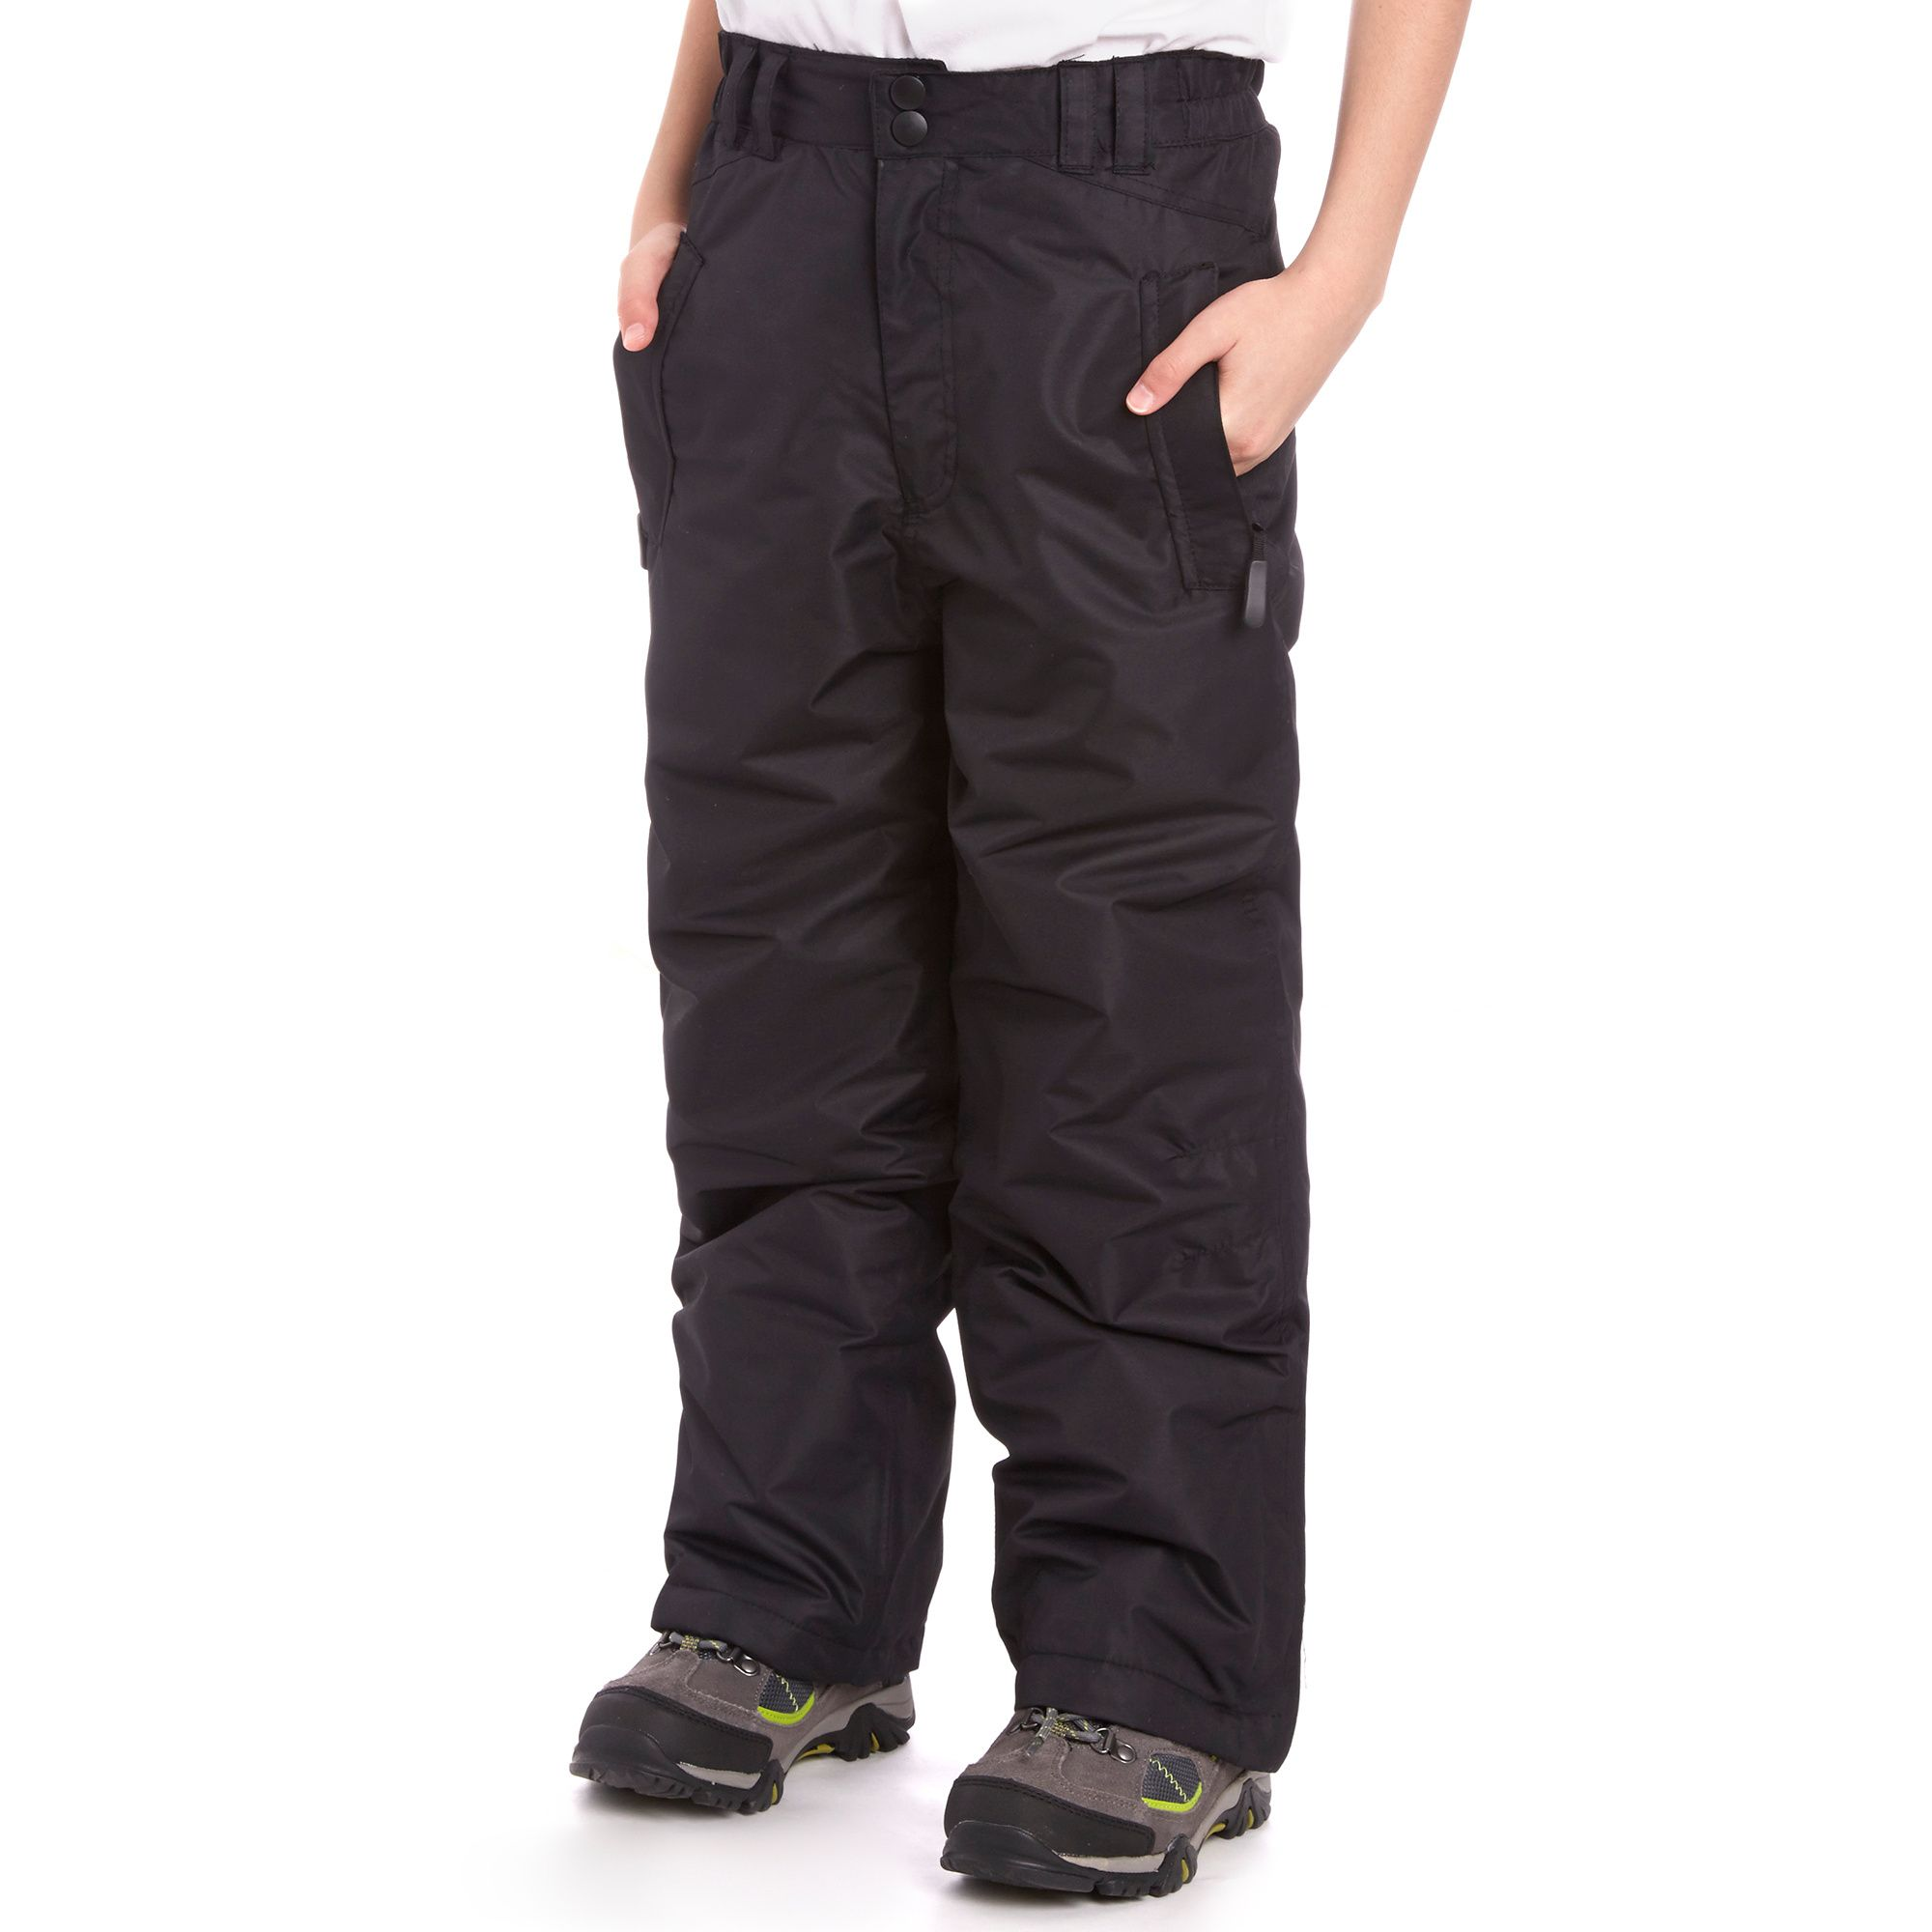 ALPINE Boy's Ski Pants